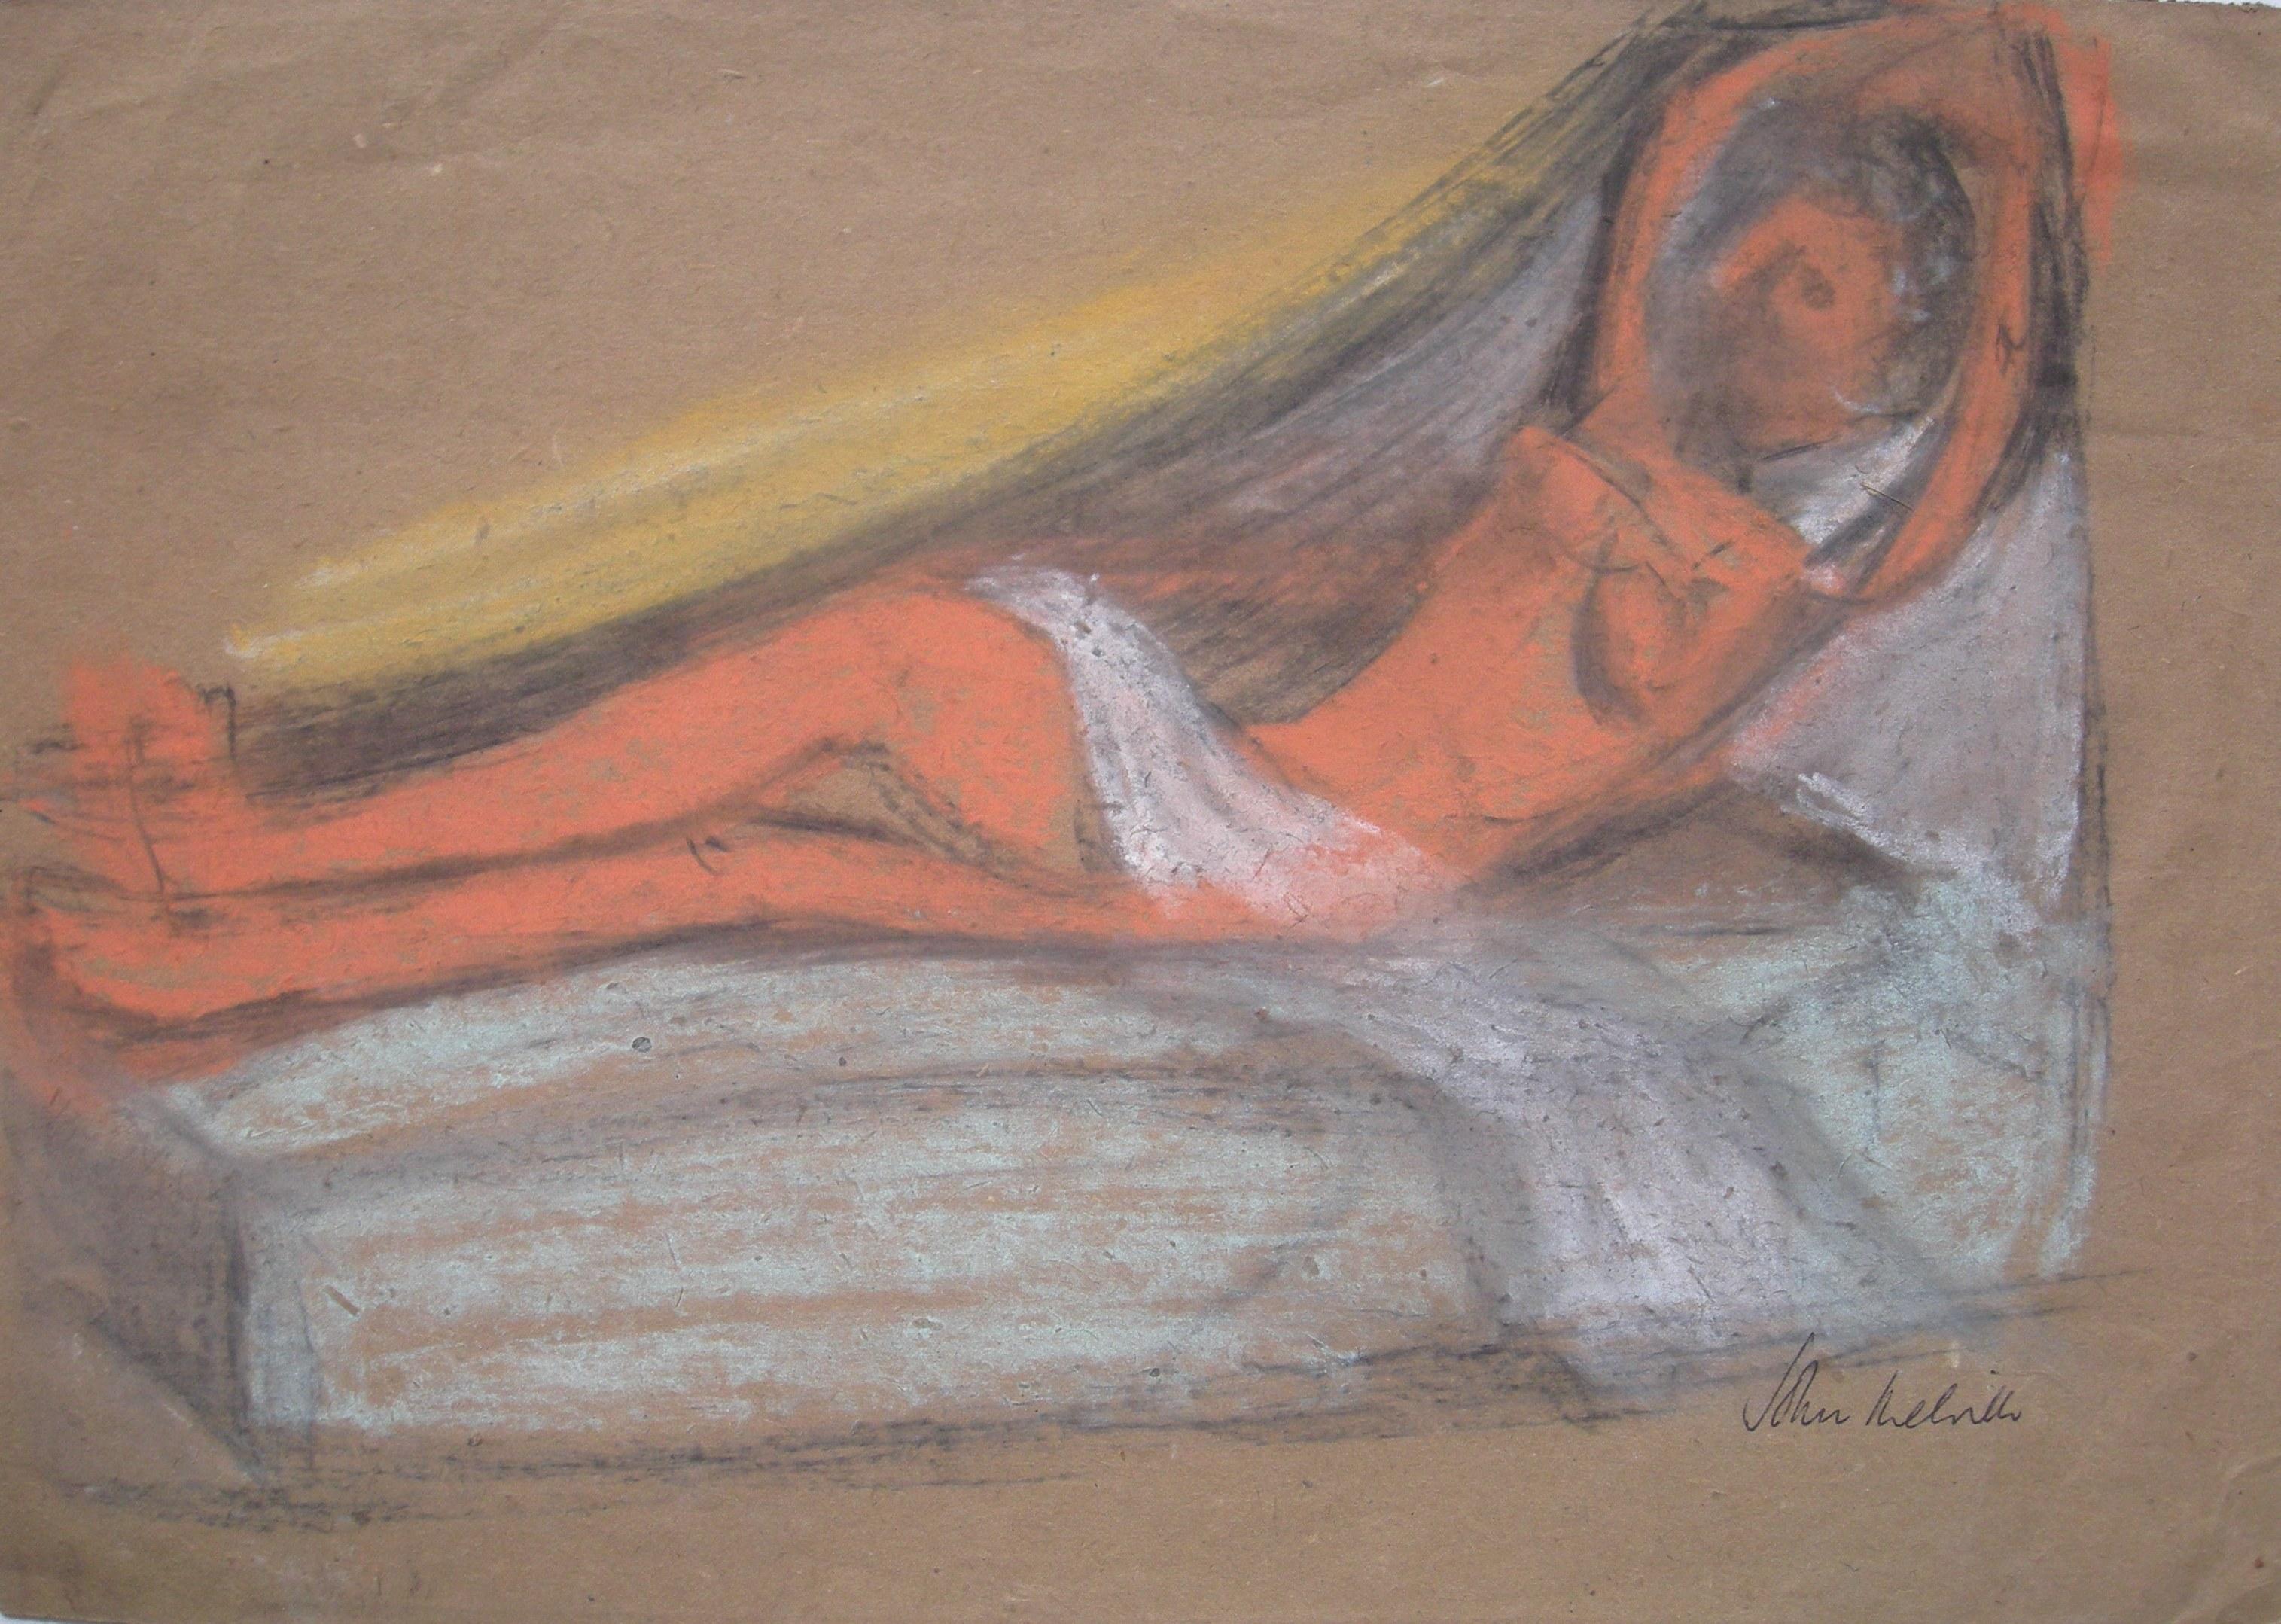 John Melville - untitled